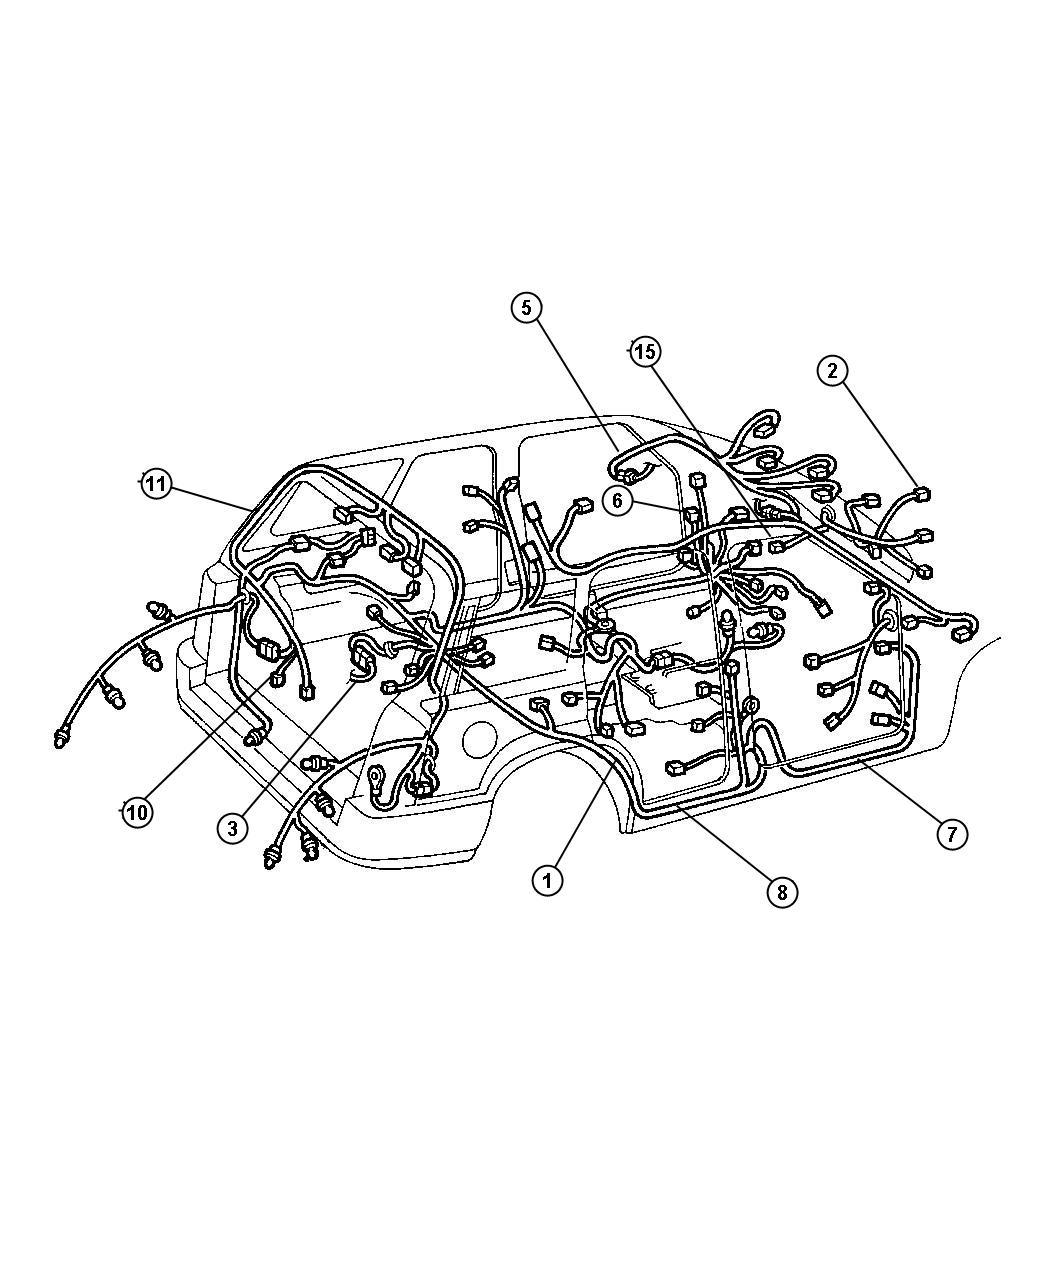 Jeep Liberty Adapter Converts 7 Way Round To 4 Way Flat